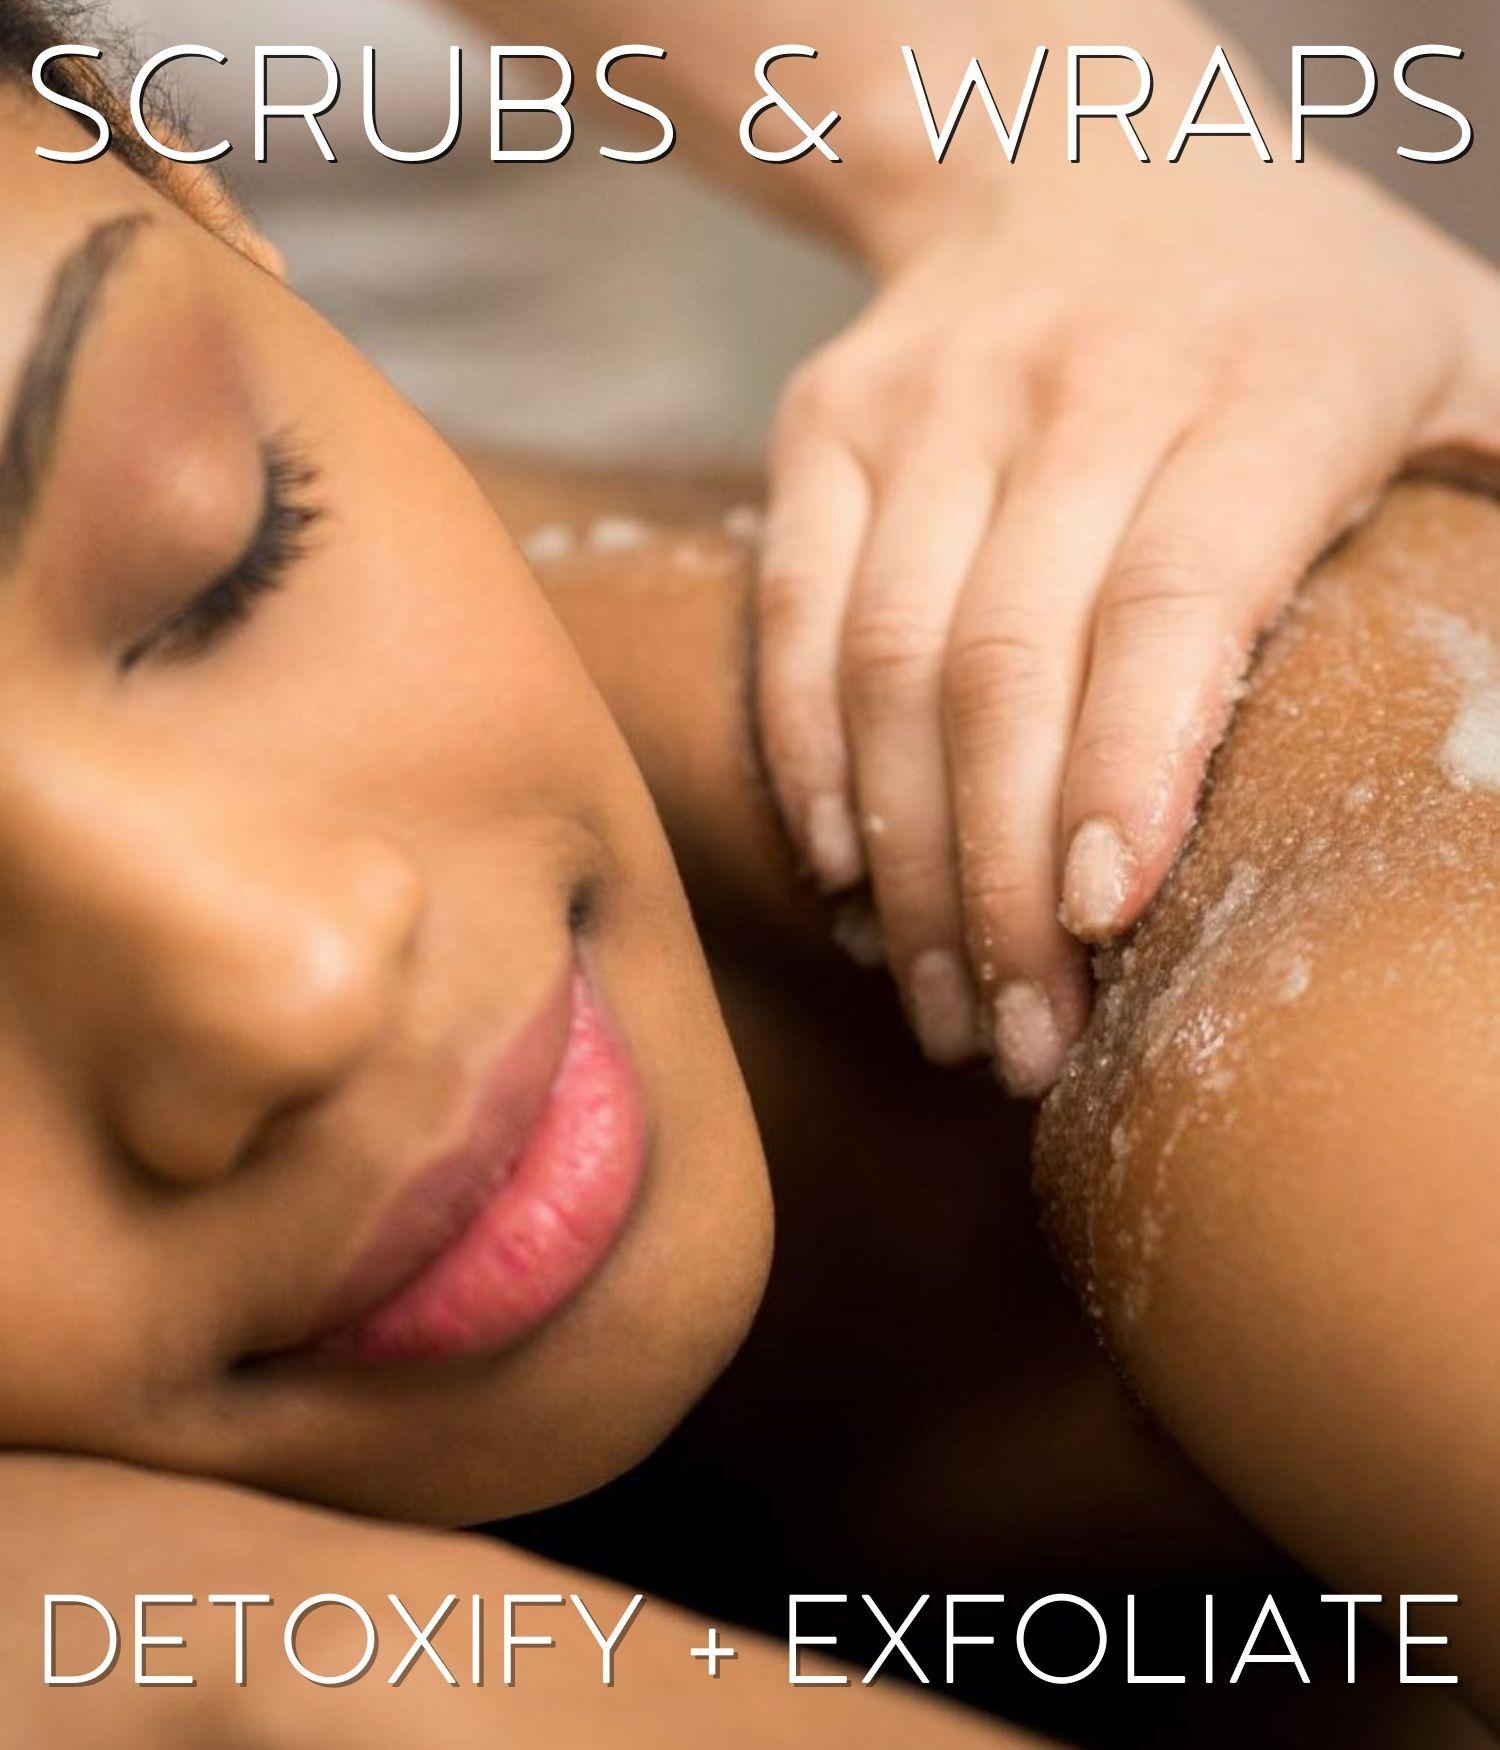 beautiful woman having scrubs and wraps treatment promoting detoxify + exfoliate